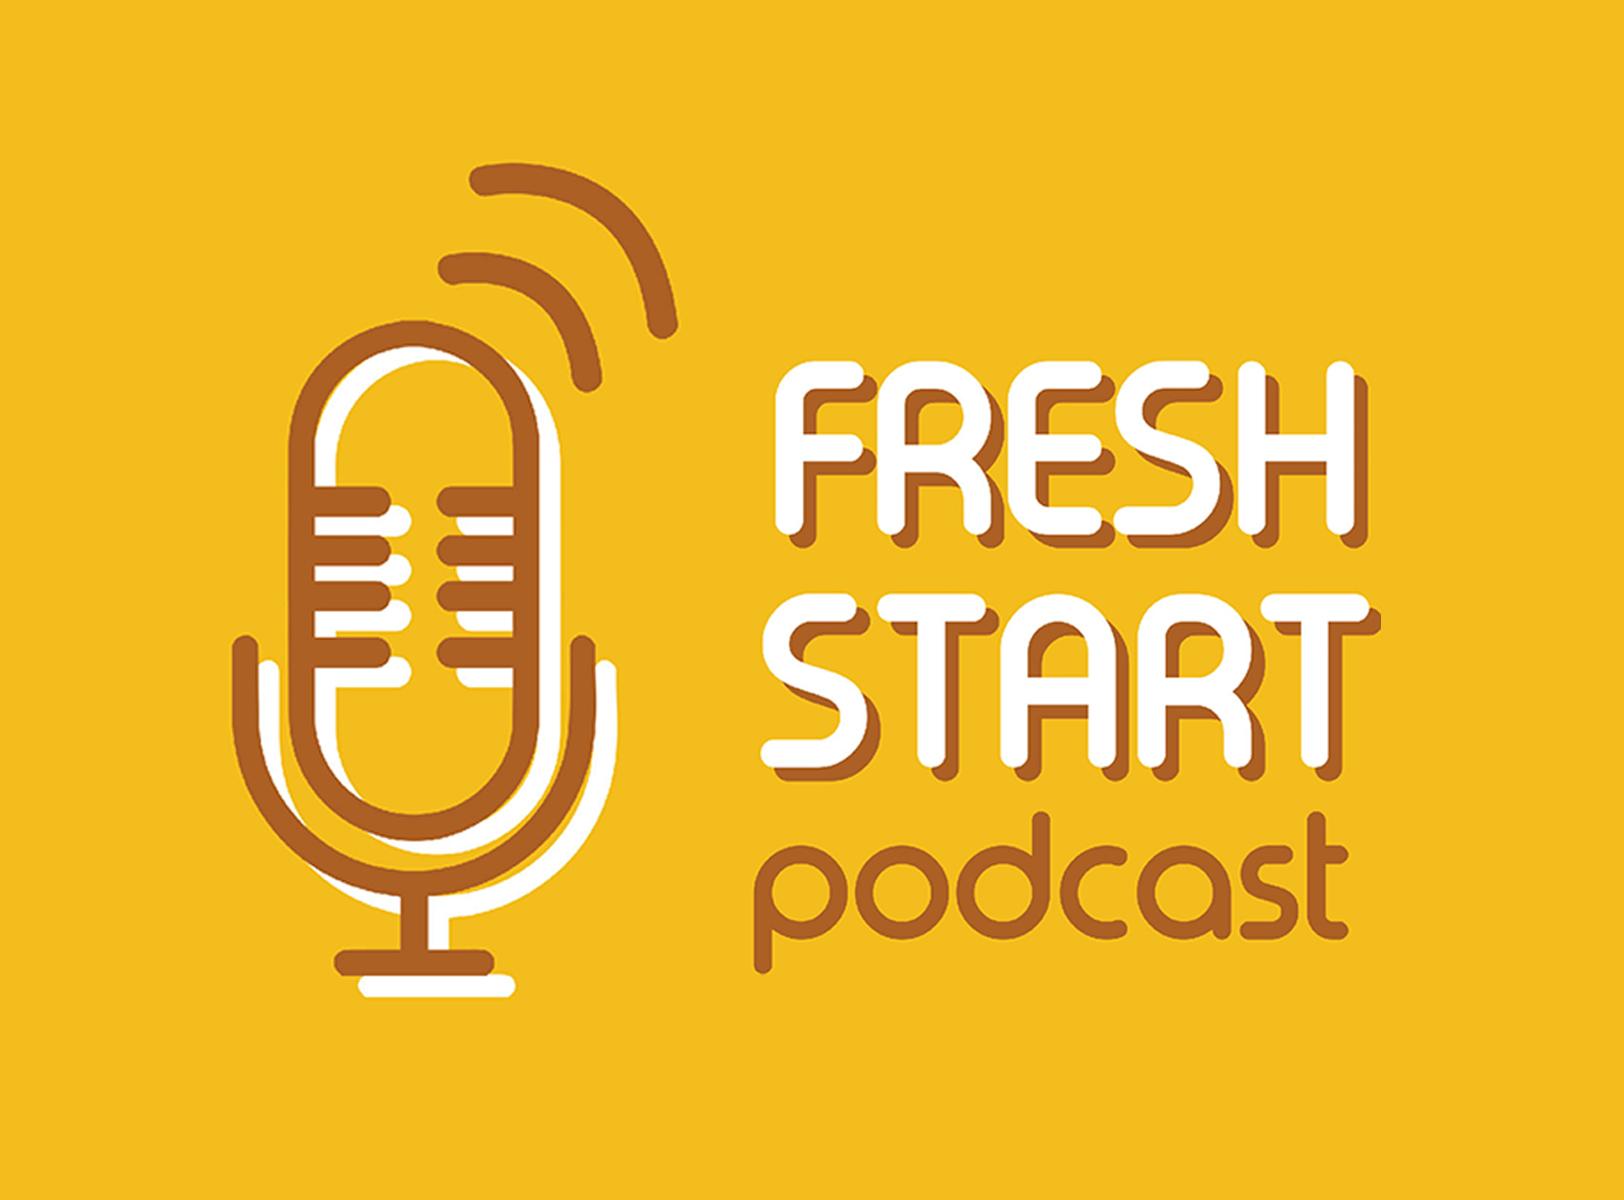 Fresh Start: Podcast News (4/16/2020 Thu.)